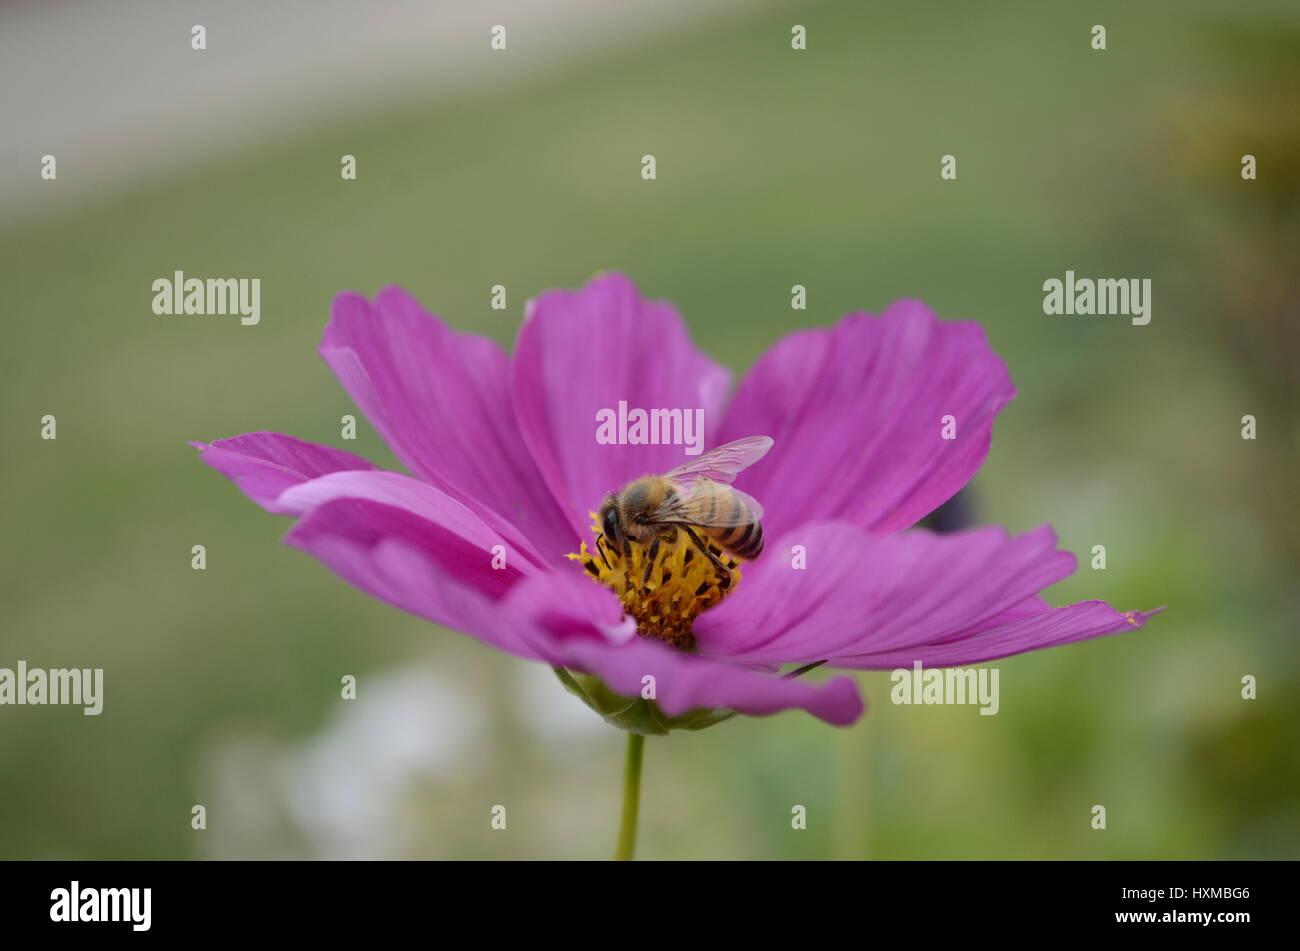 Bee on purple pink cosmos flower - Stock Image